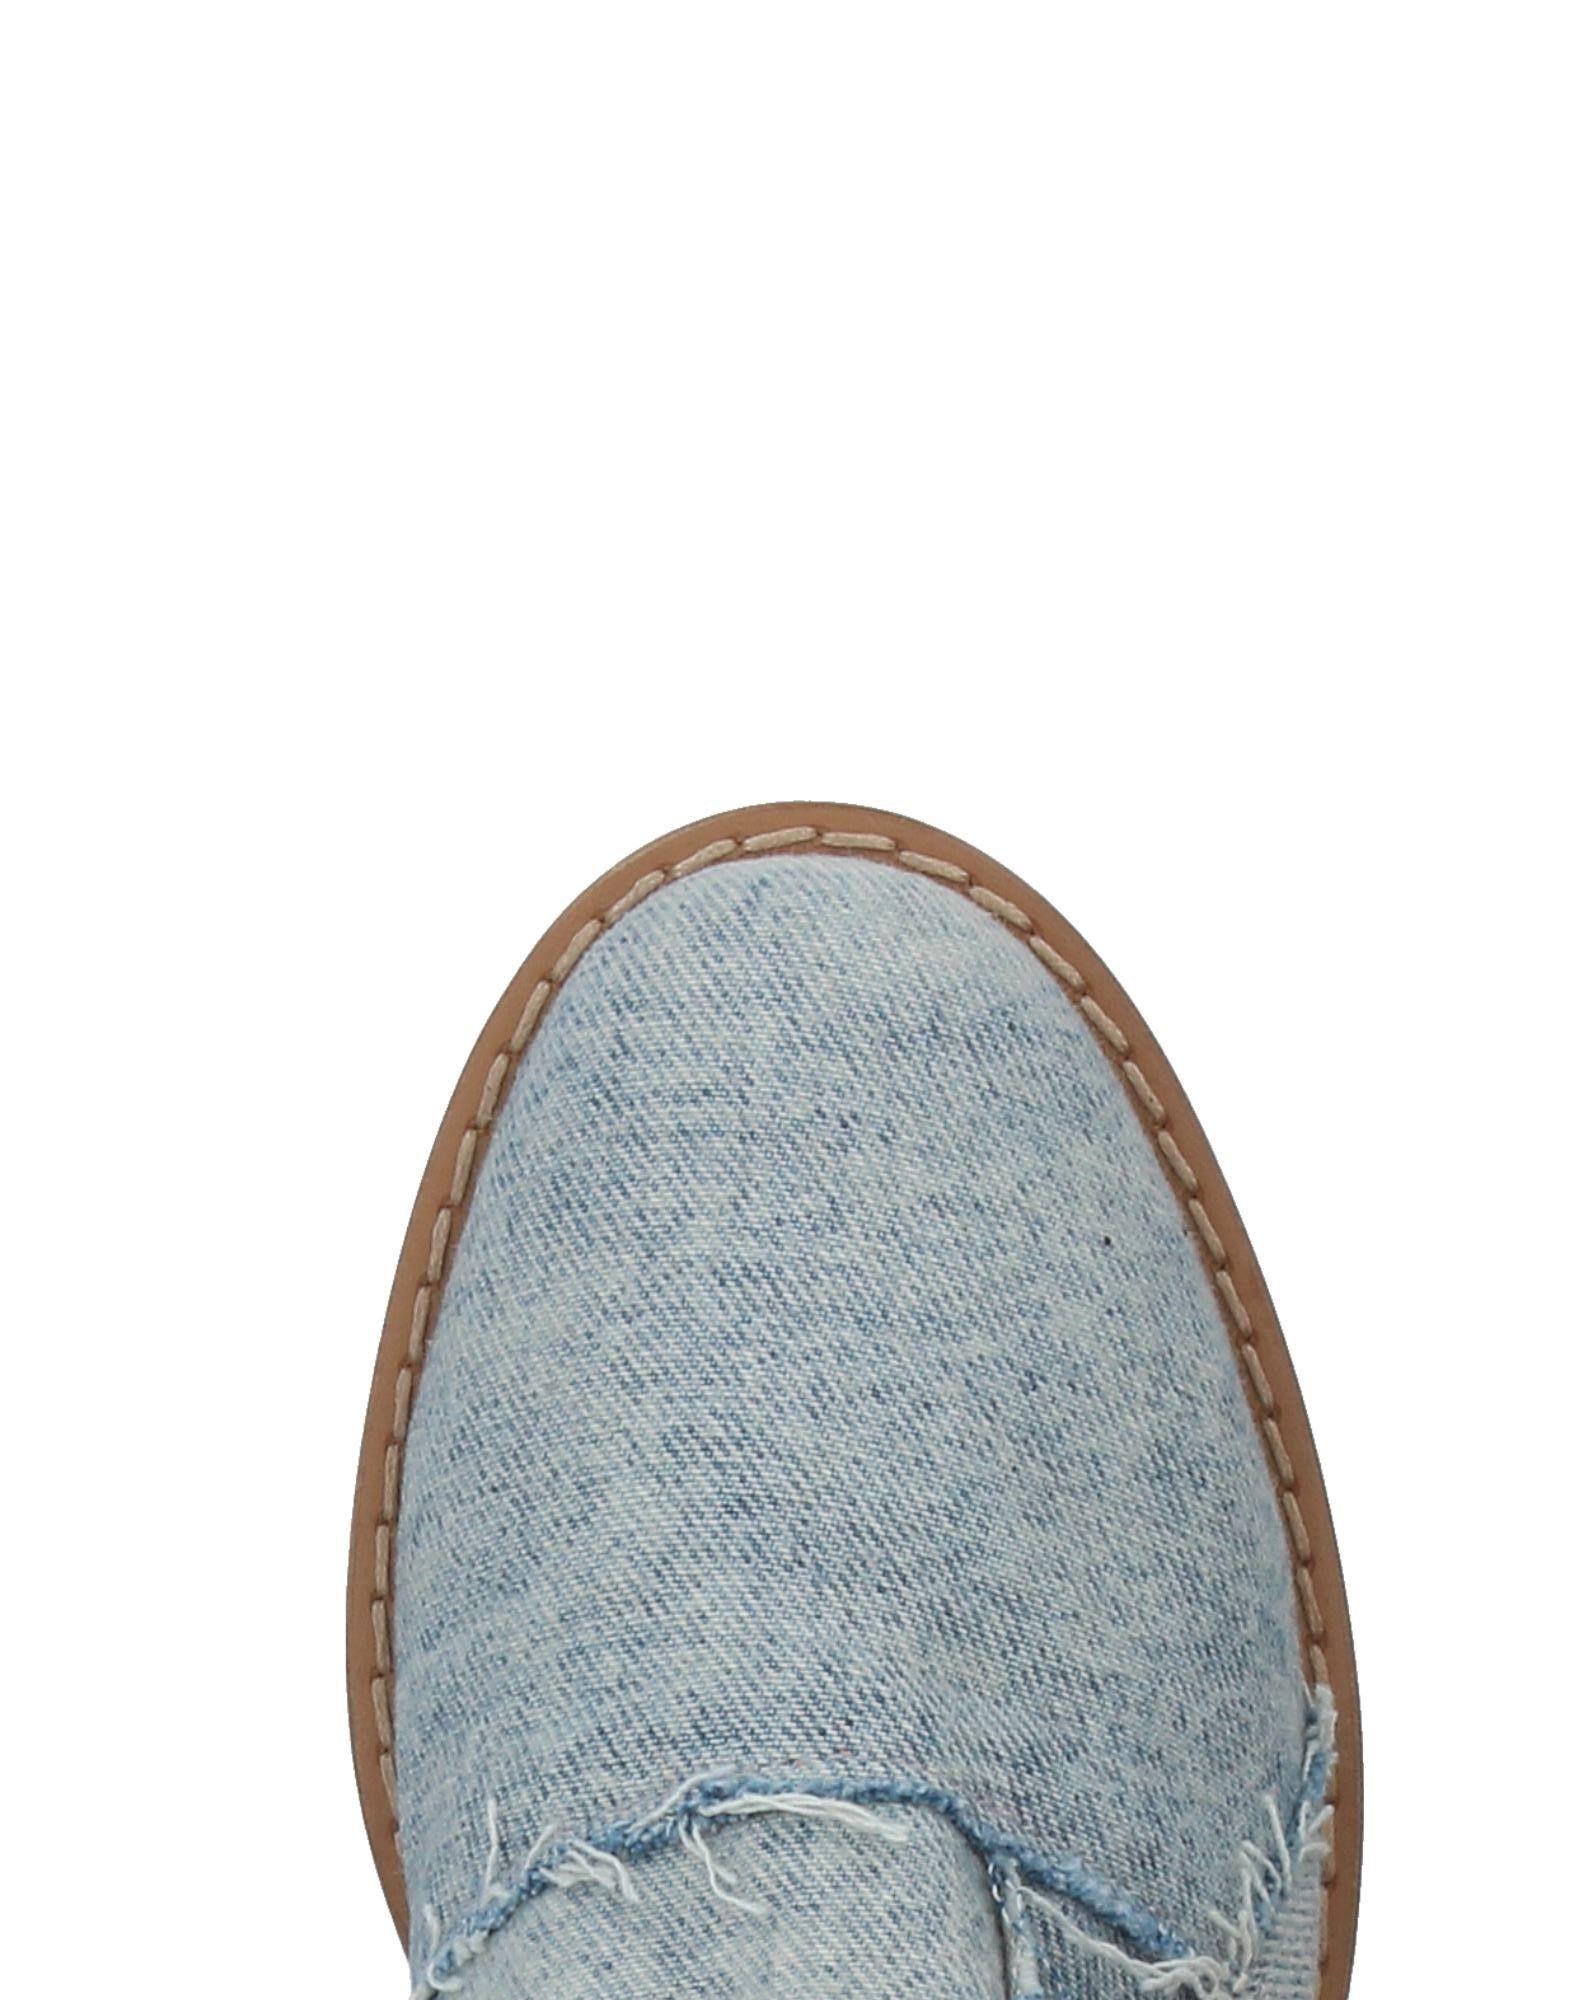 Stilvolle Margiela billige Schuhe Mm6 Maison Margiela Stilvolle Sneakers Damen  11403475CJ d2a16b